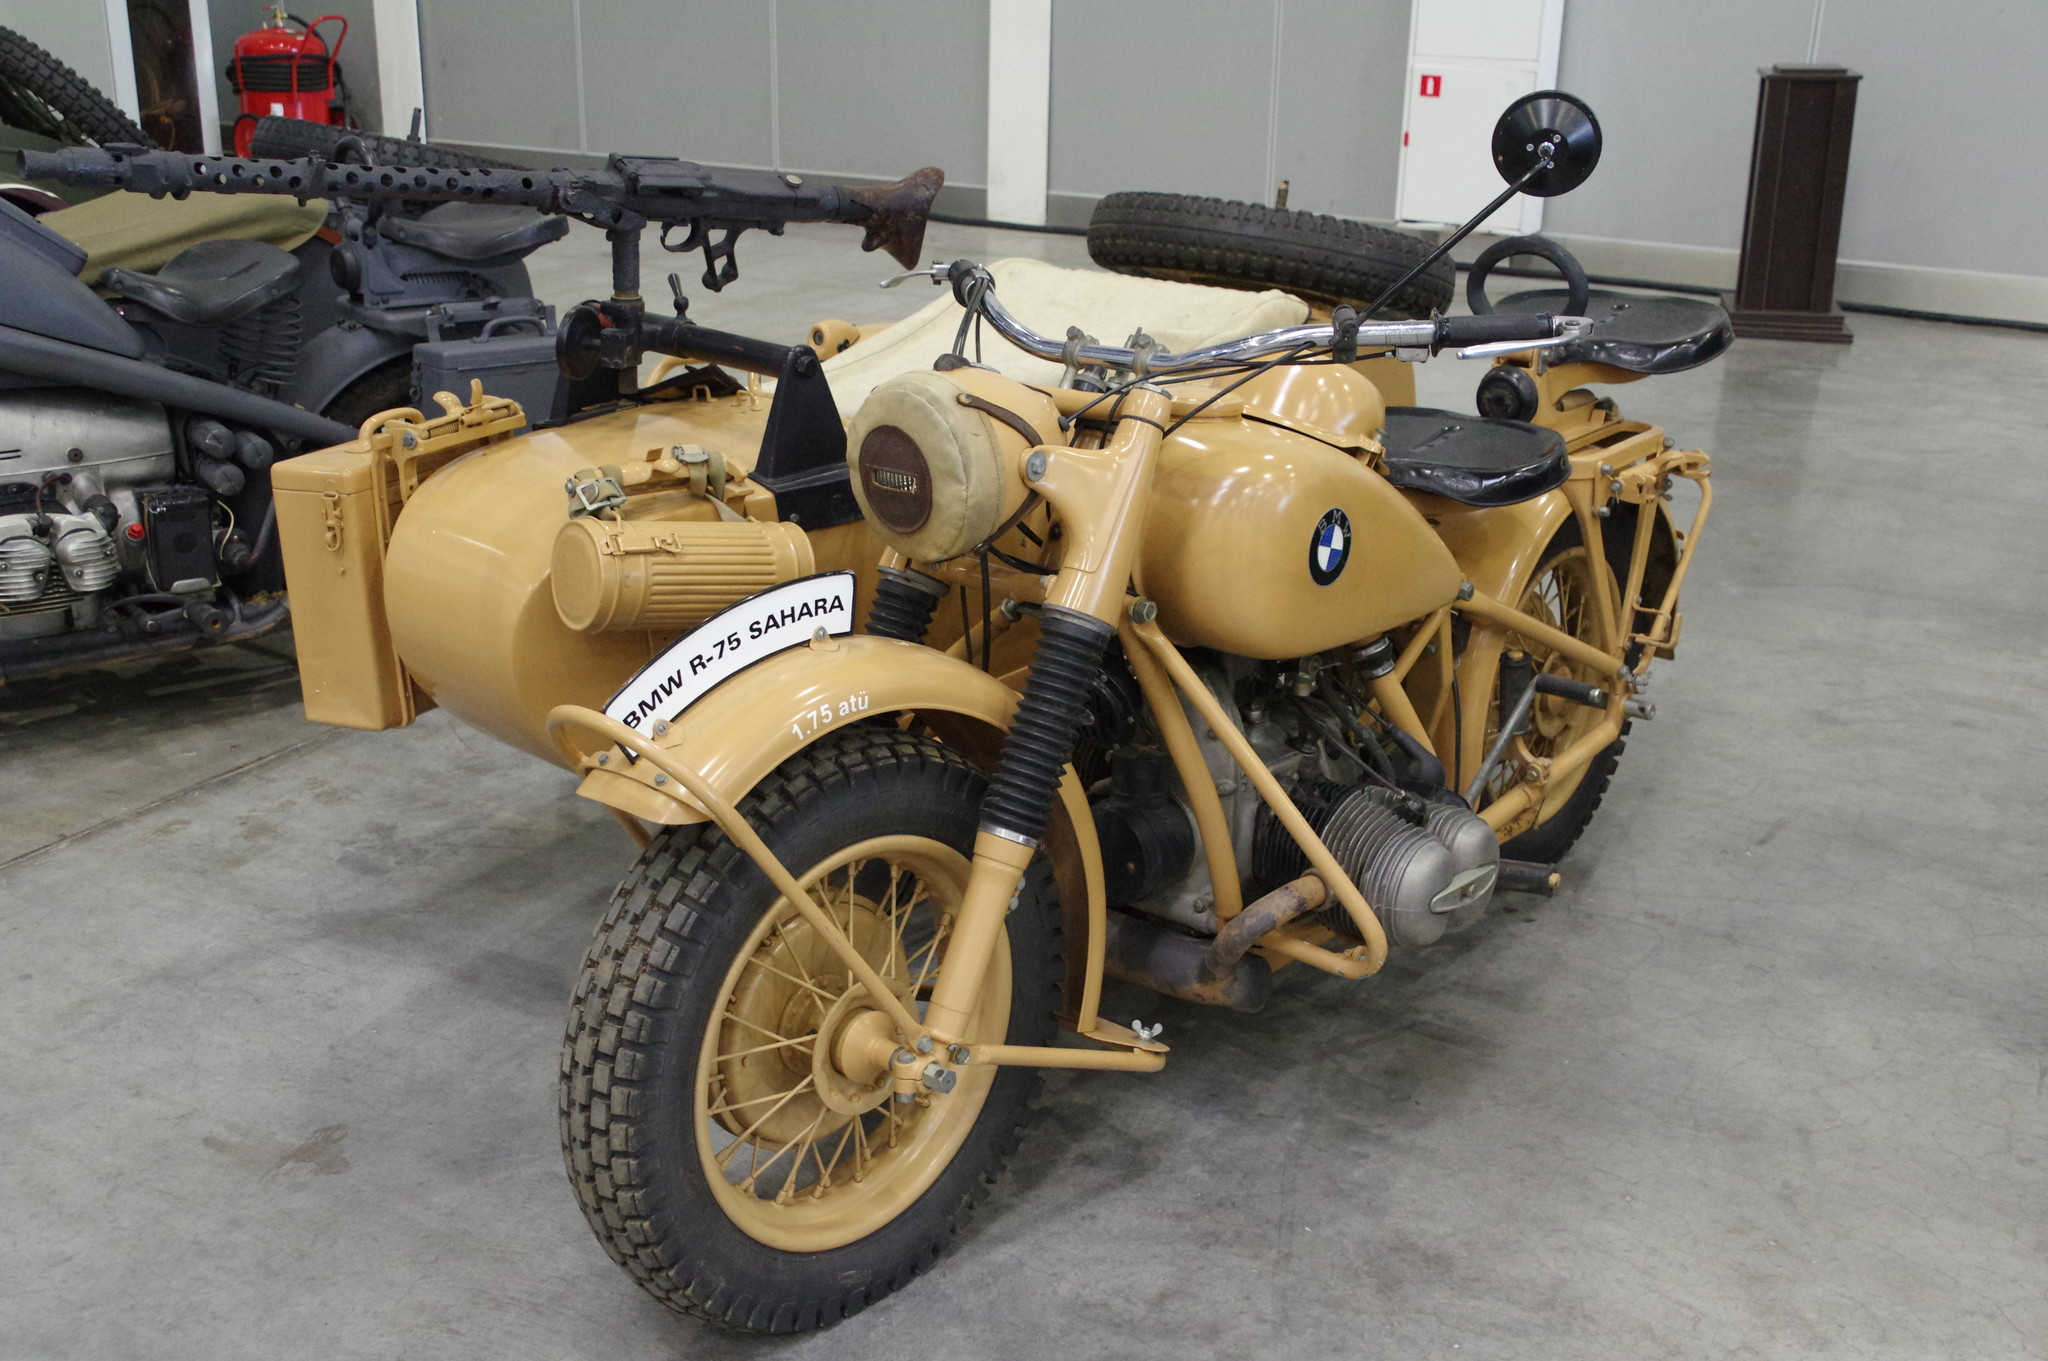 Мотоцикл BMW R75 «Sahara»